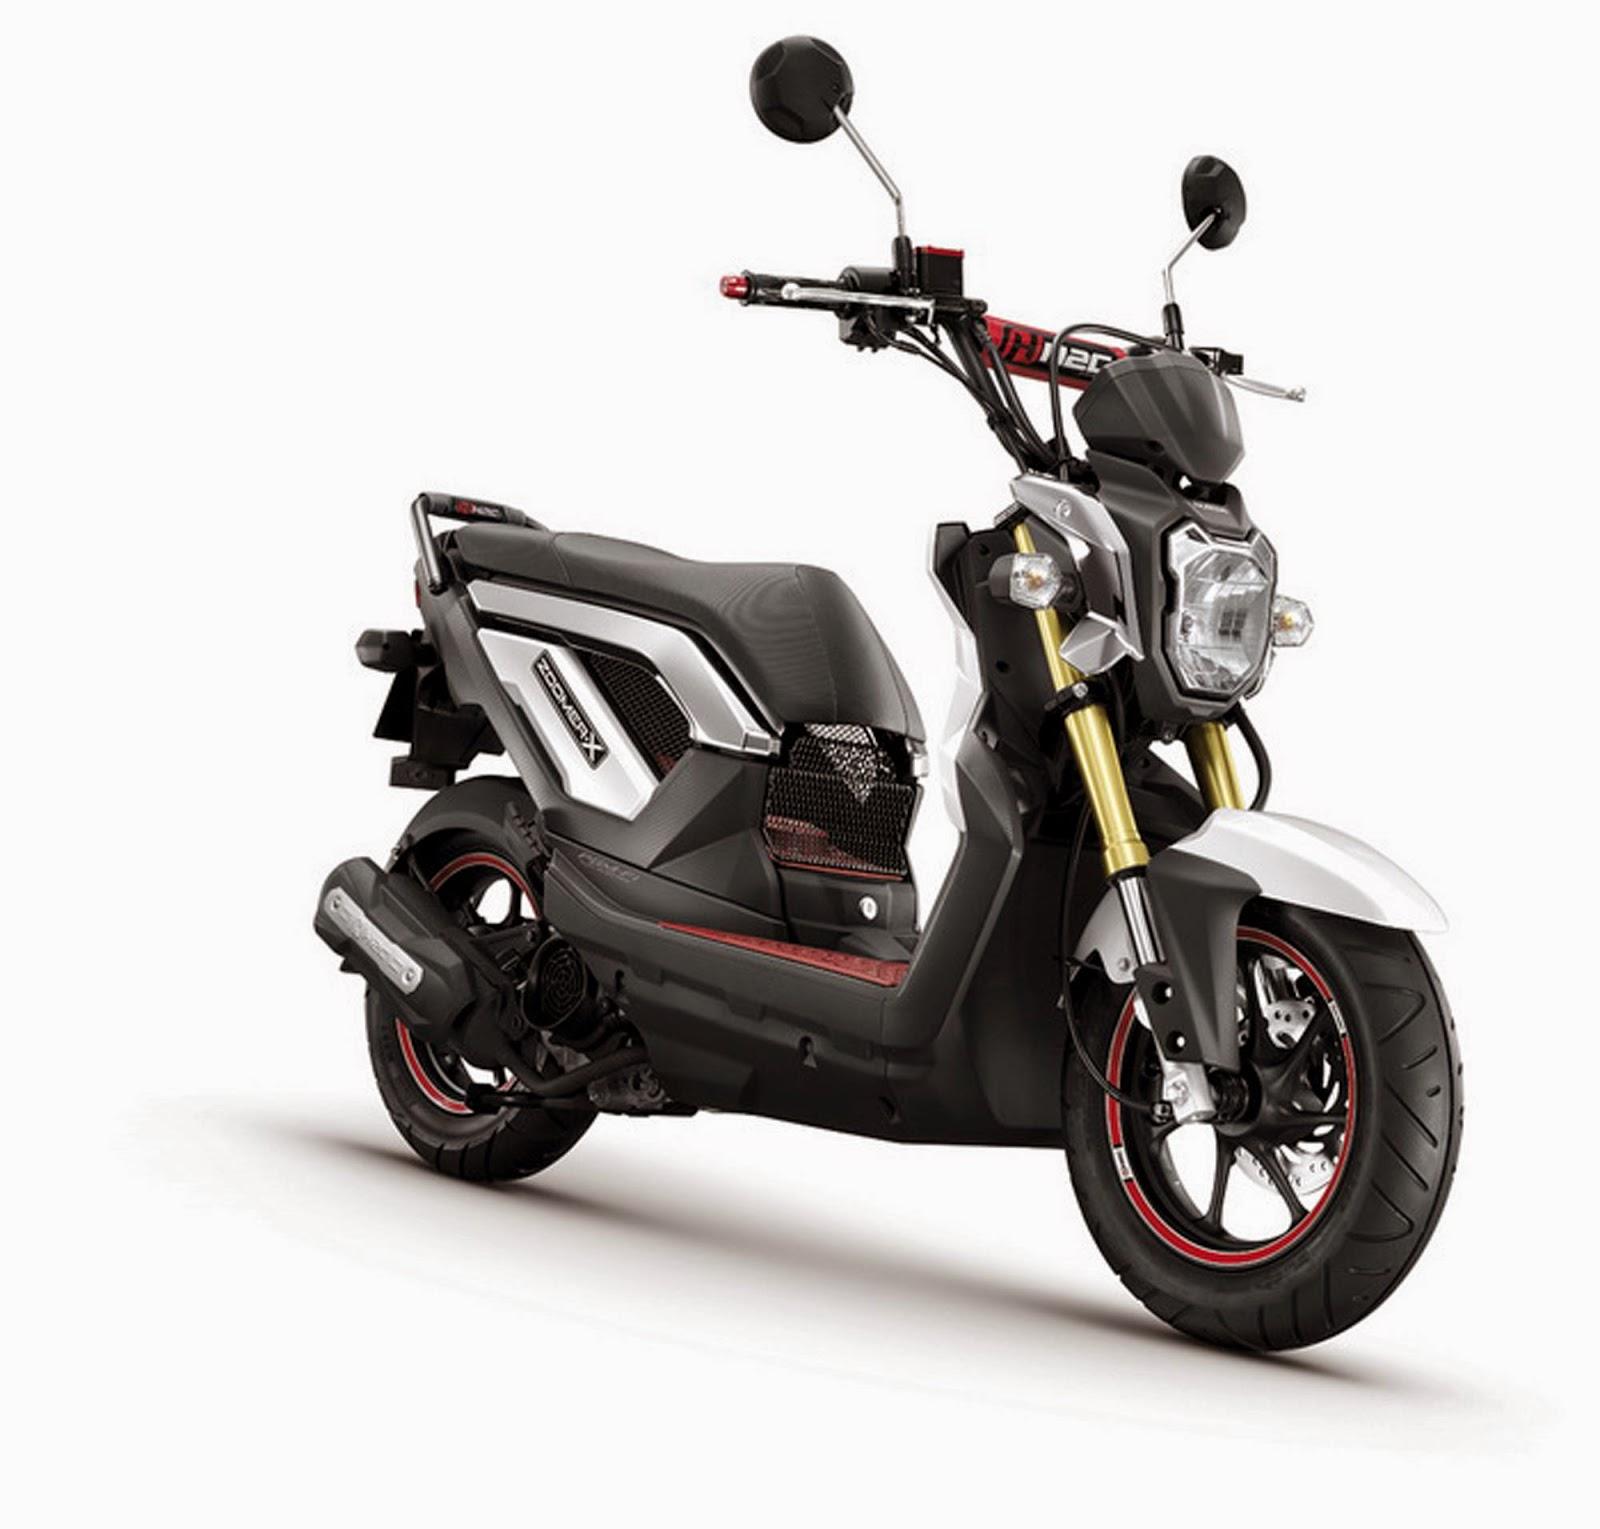 Honda Zoomer x 2015 -Price 2100$ - Phnom Penh Motors